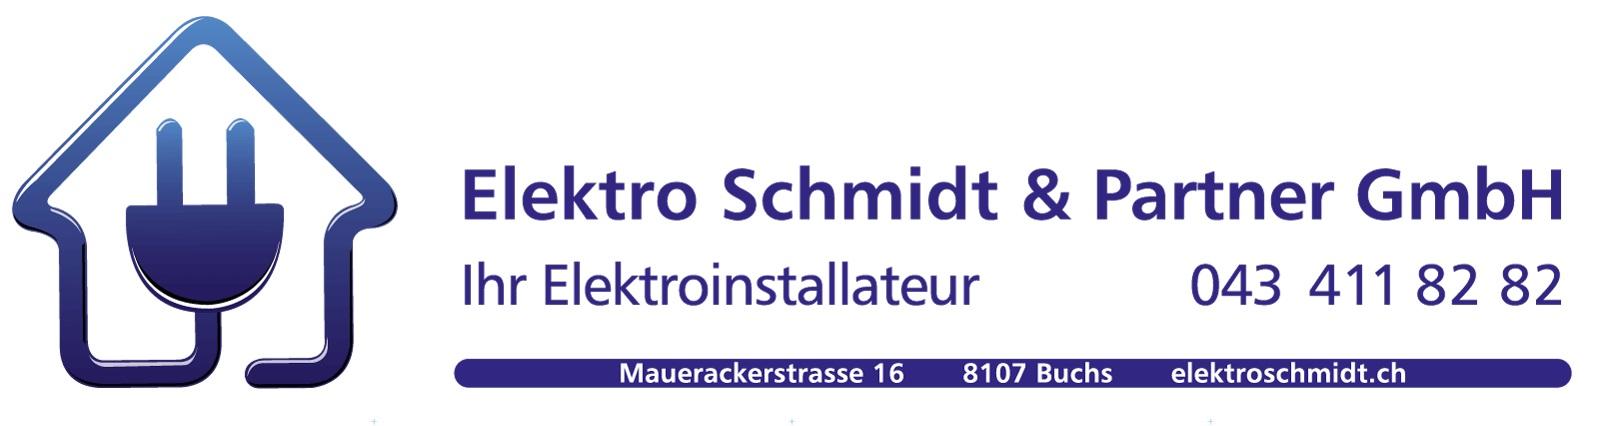 ElektroSchmidt-_-Banner-web